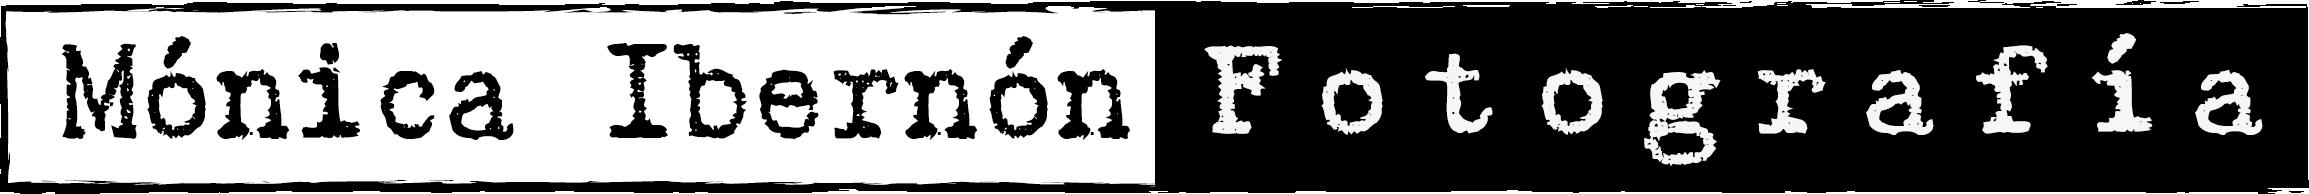 Logo Fondo oscuro horizontal